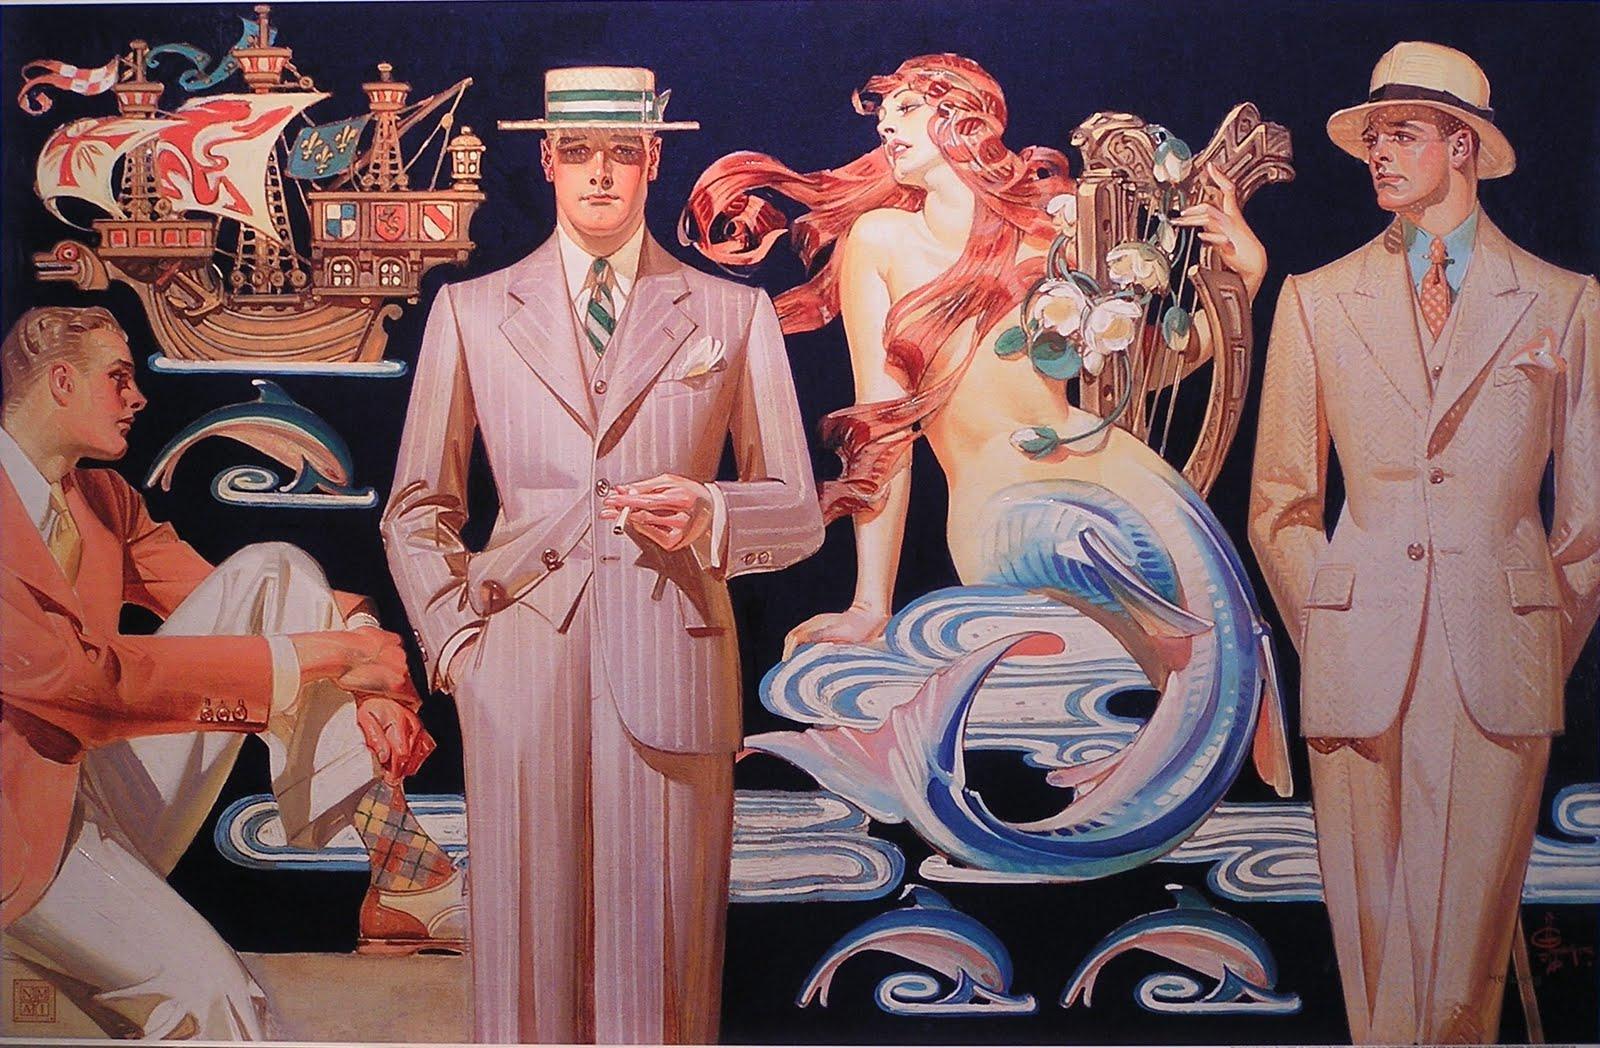 J. C. Leyendecker 1930